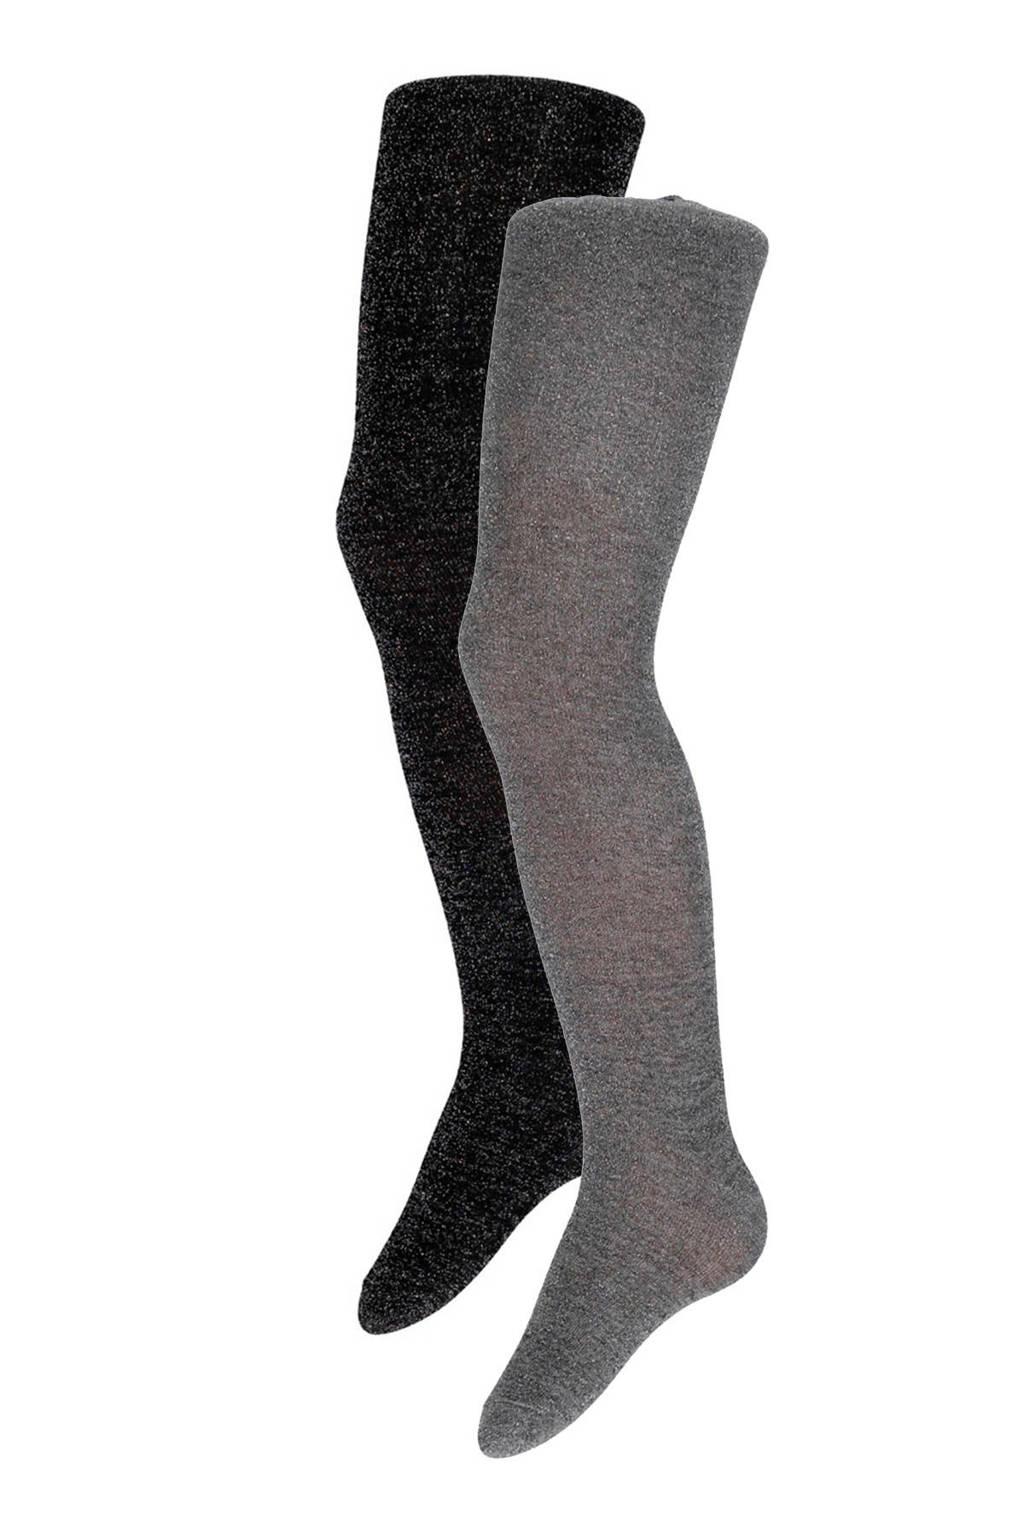 Apollo maillot ( 2 paar), Zwart/grijs